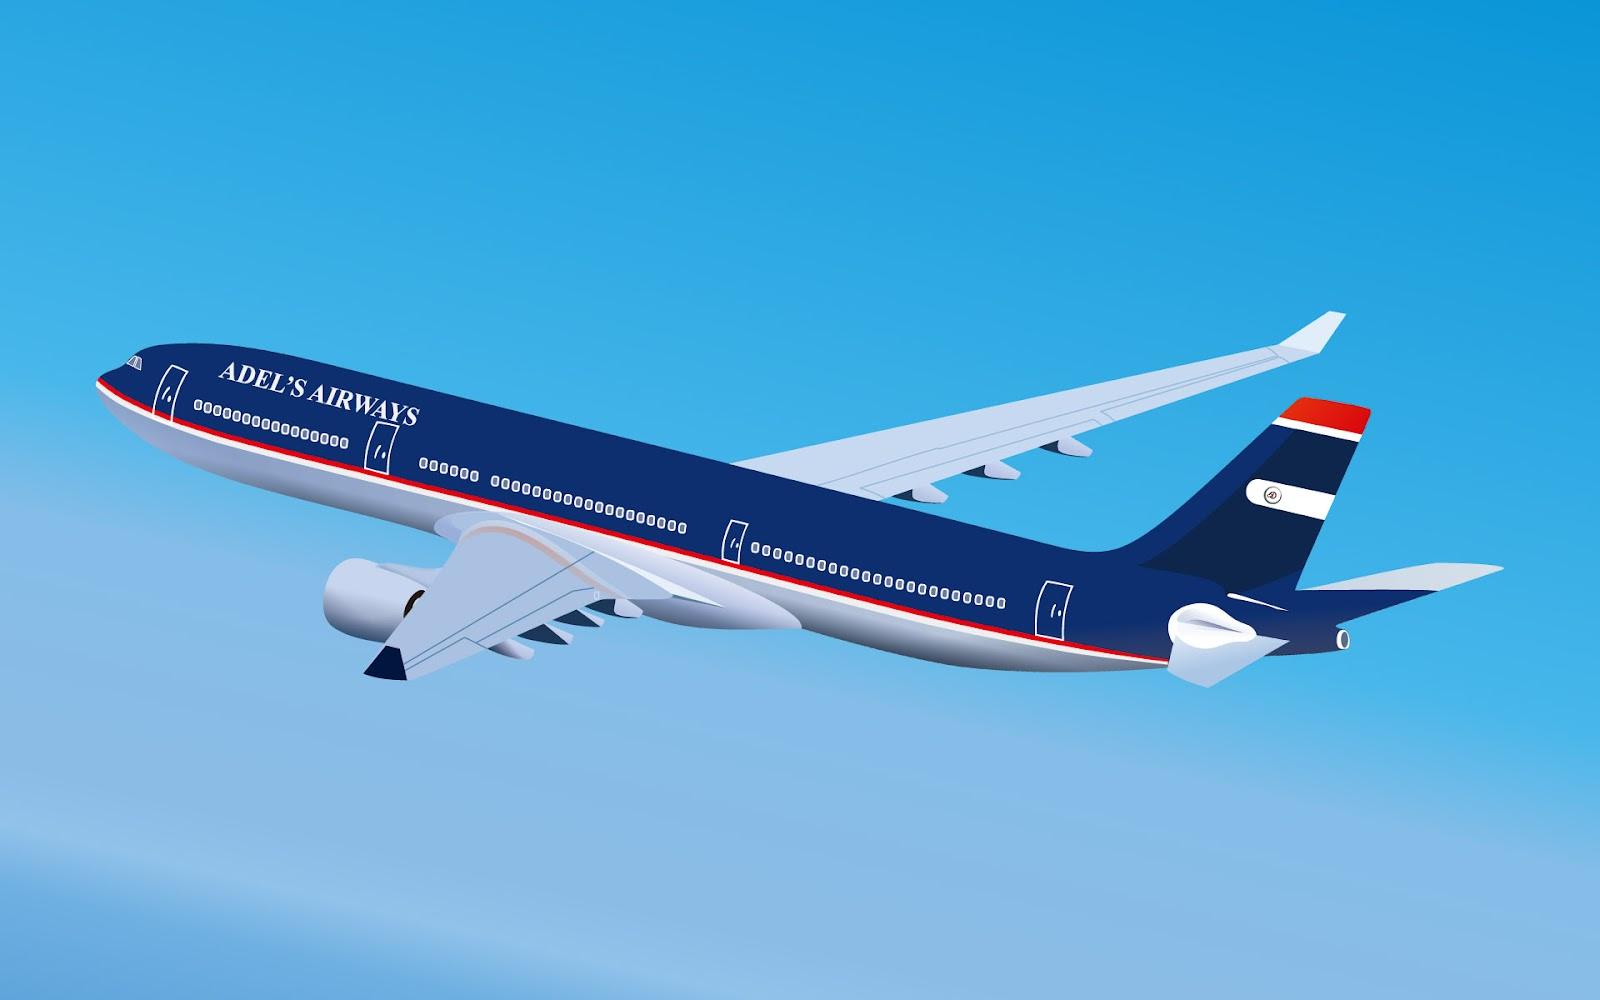 WALLPAPERS: aeroplane wallpapers   airplane wallpapers ...